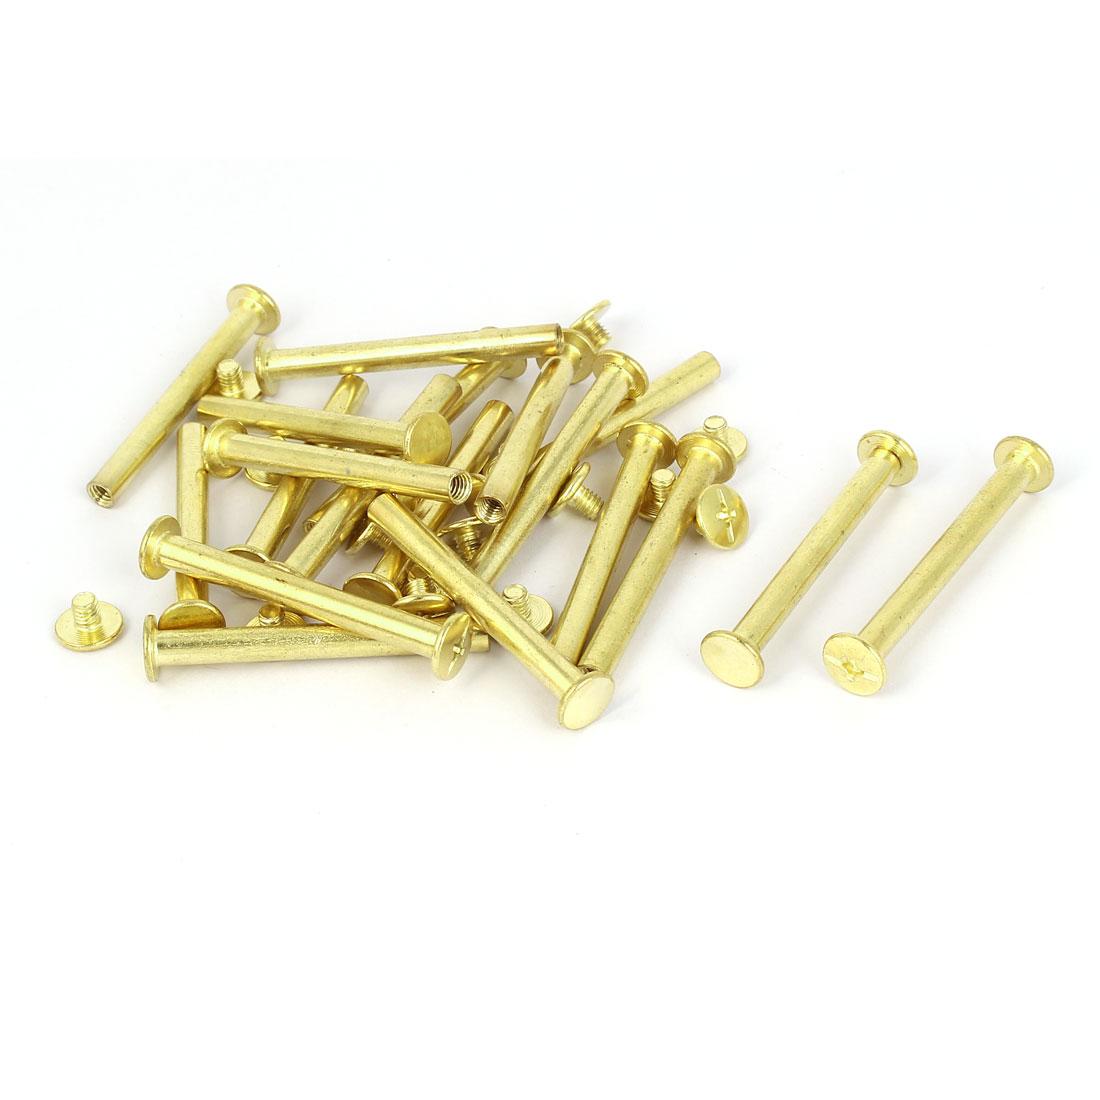 5mmx45mm Brass Plated Chicago Screws Binding Posts Docking Rivet 20pcs